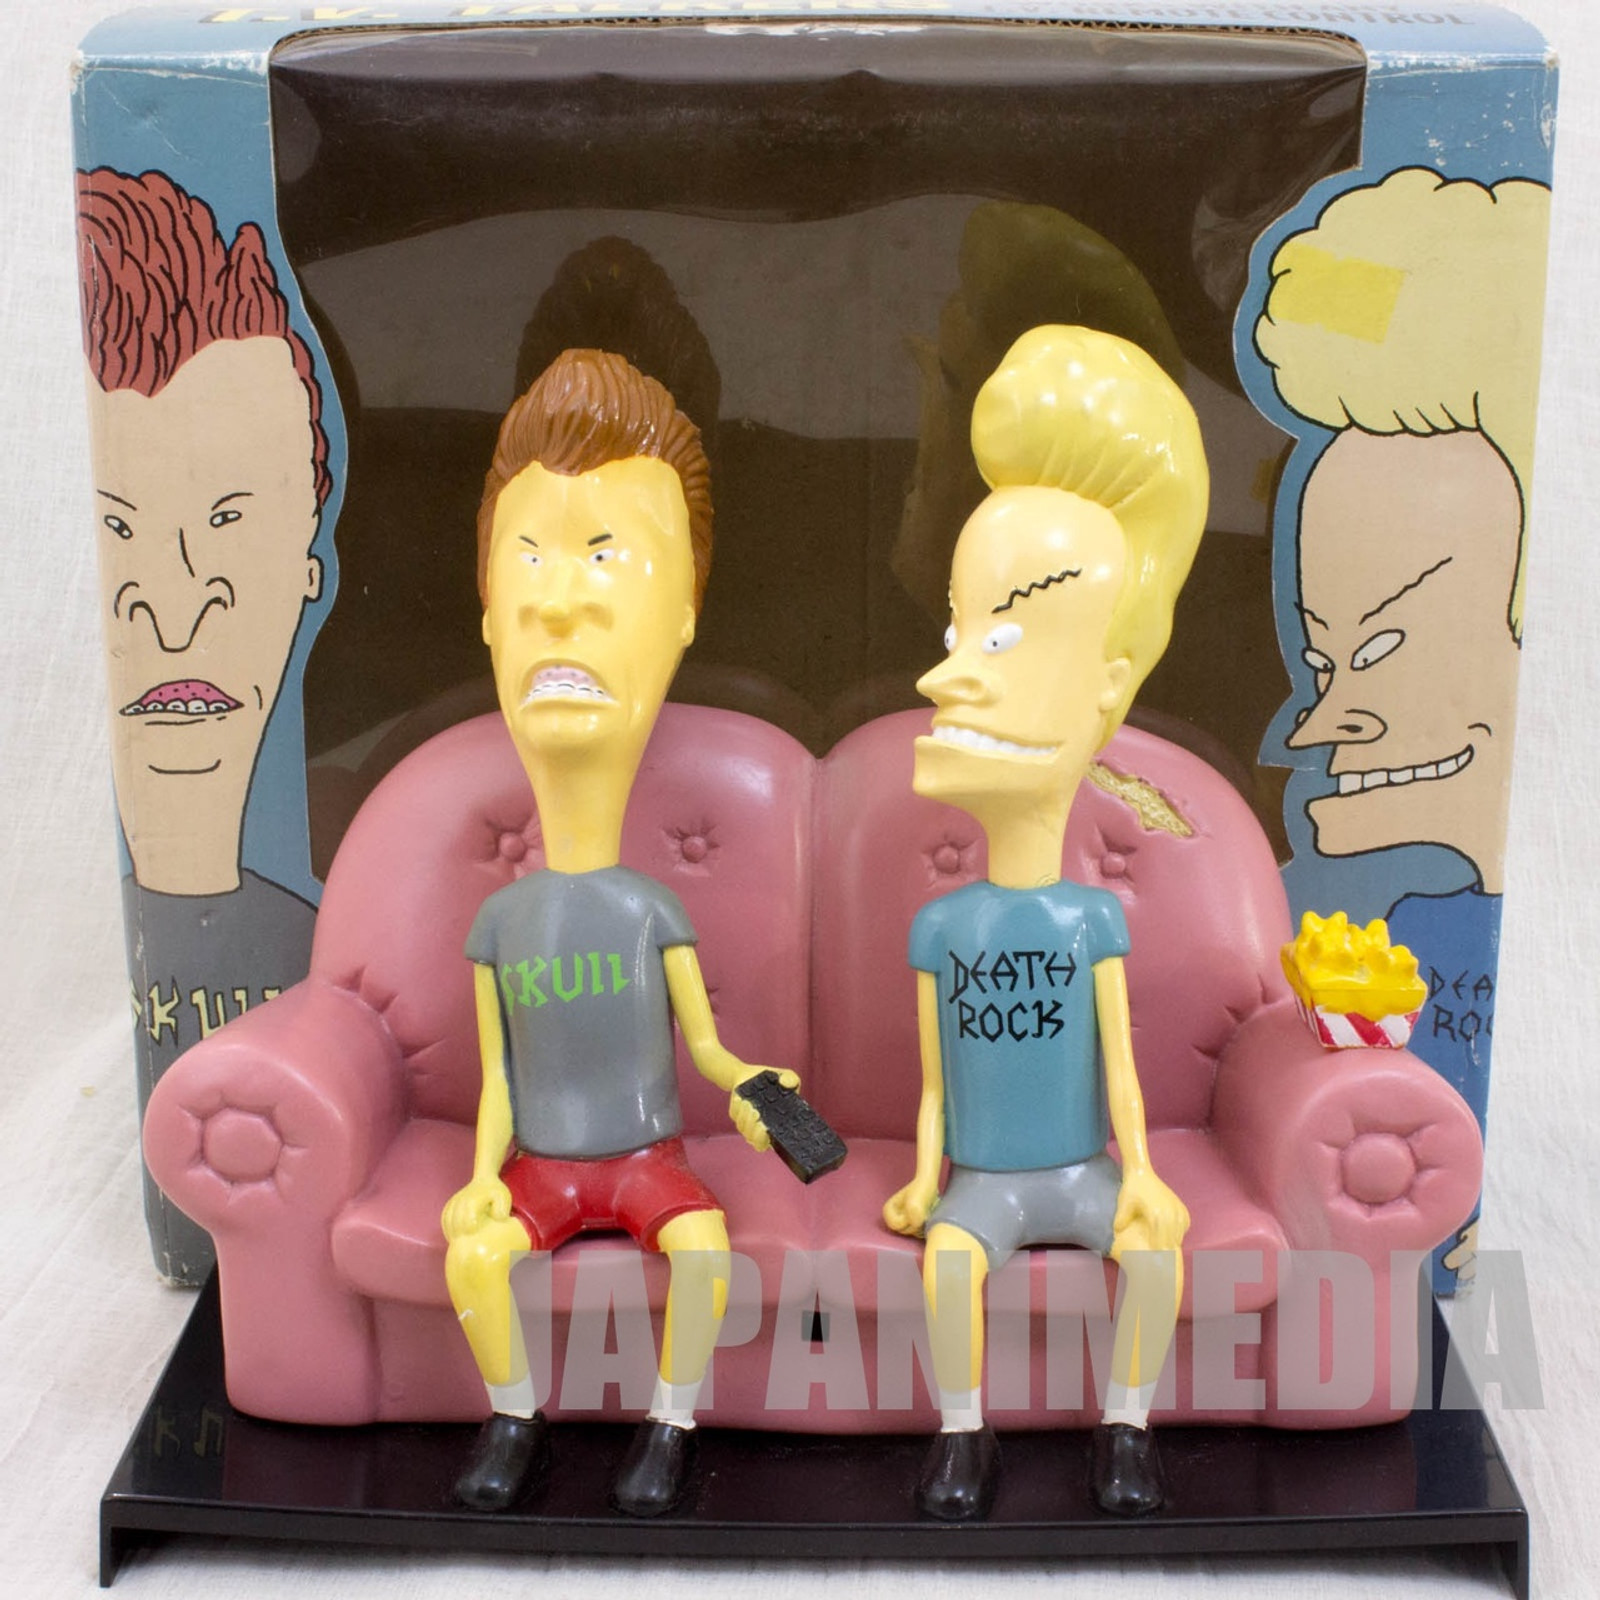 Beavis And Butt-Head on Couch Sofa TV's Talkers Figure MTV ANIME